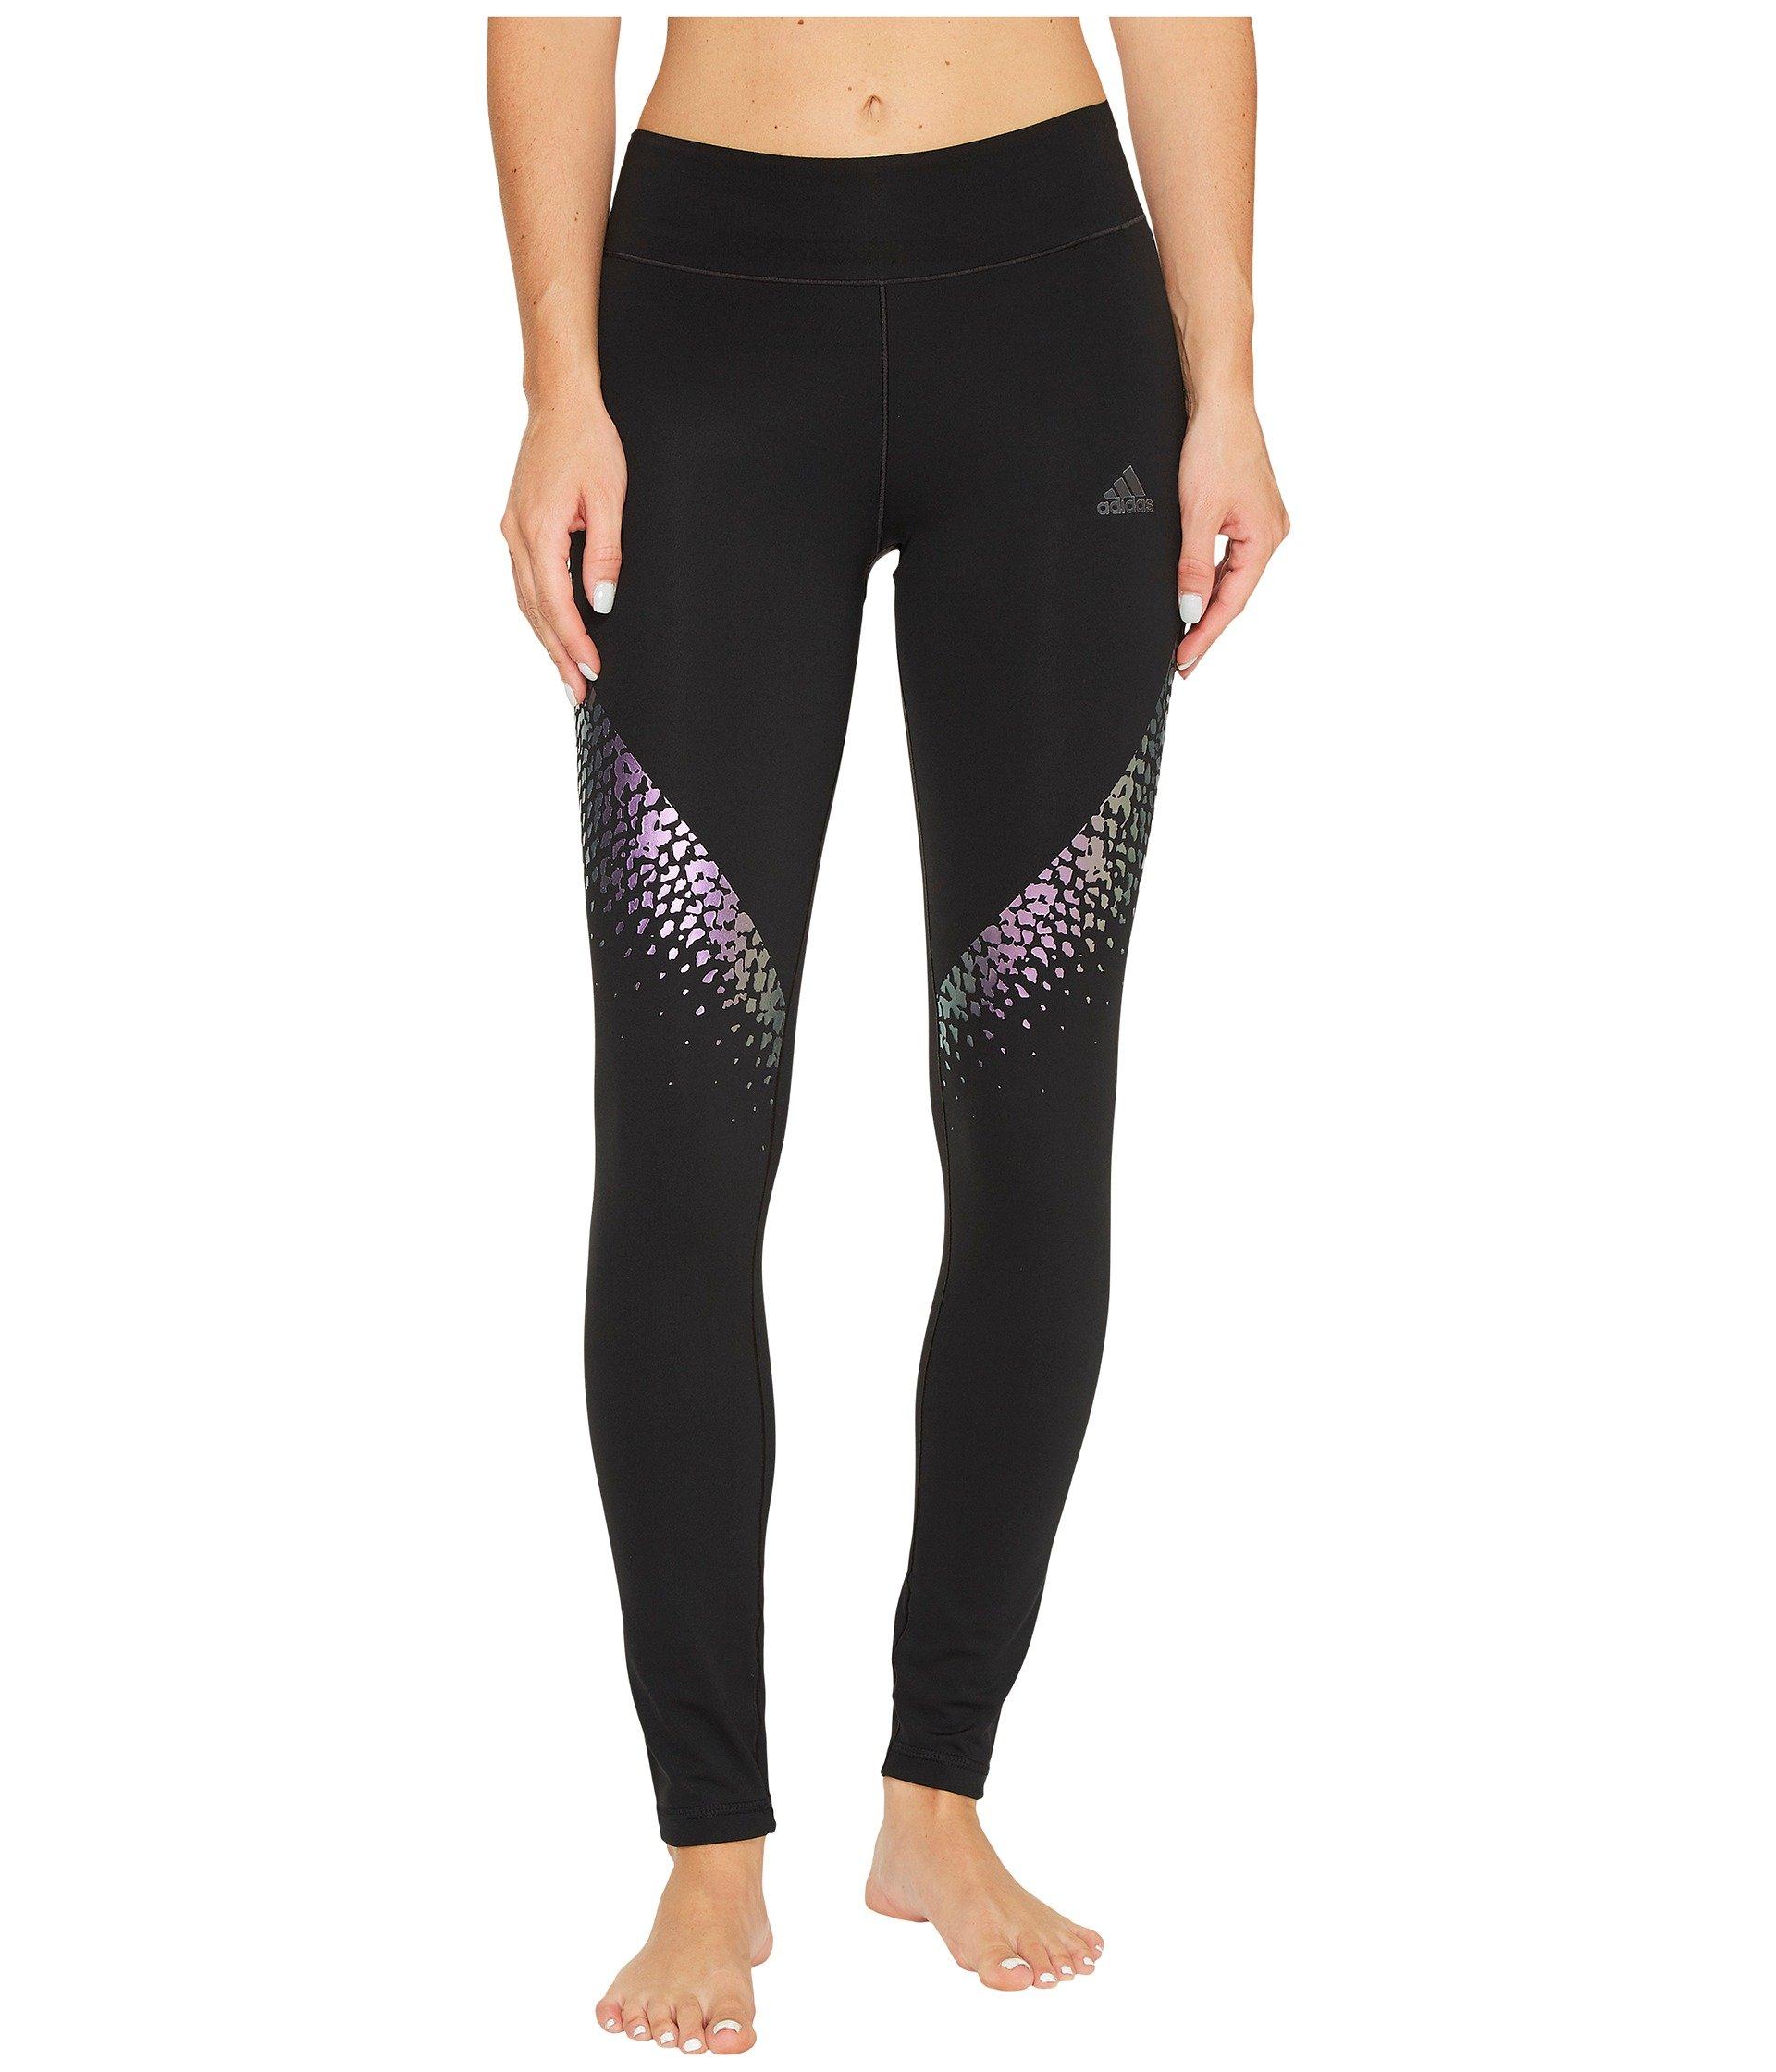 adidas Women's Training Wow Drop Tights, Black/Metallic Stripe, Large